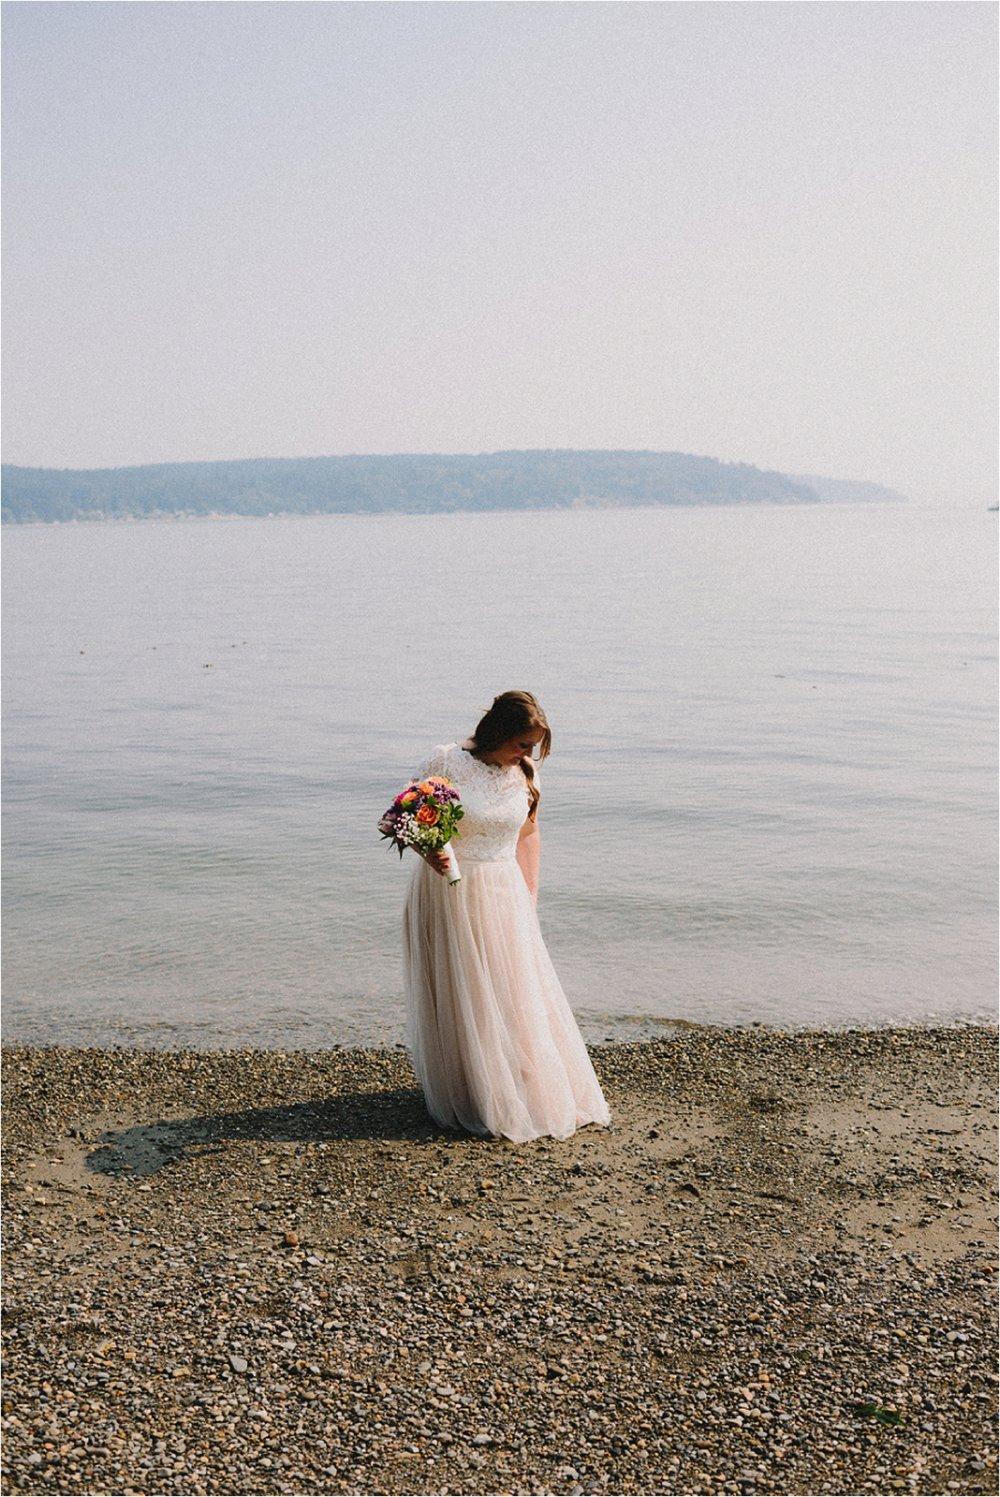 owen-beach-priest-point-park-tacoma-washington-elopement-jannicka-mayte-anchorage-alaska-wedding-elopement-photographer (53).jpg